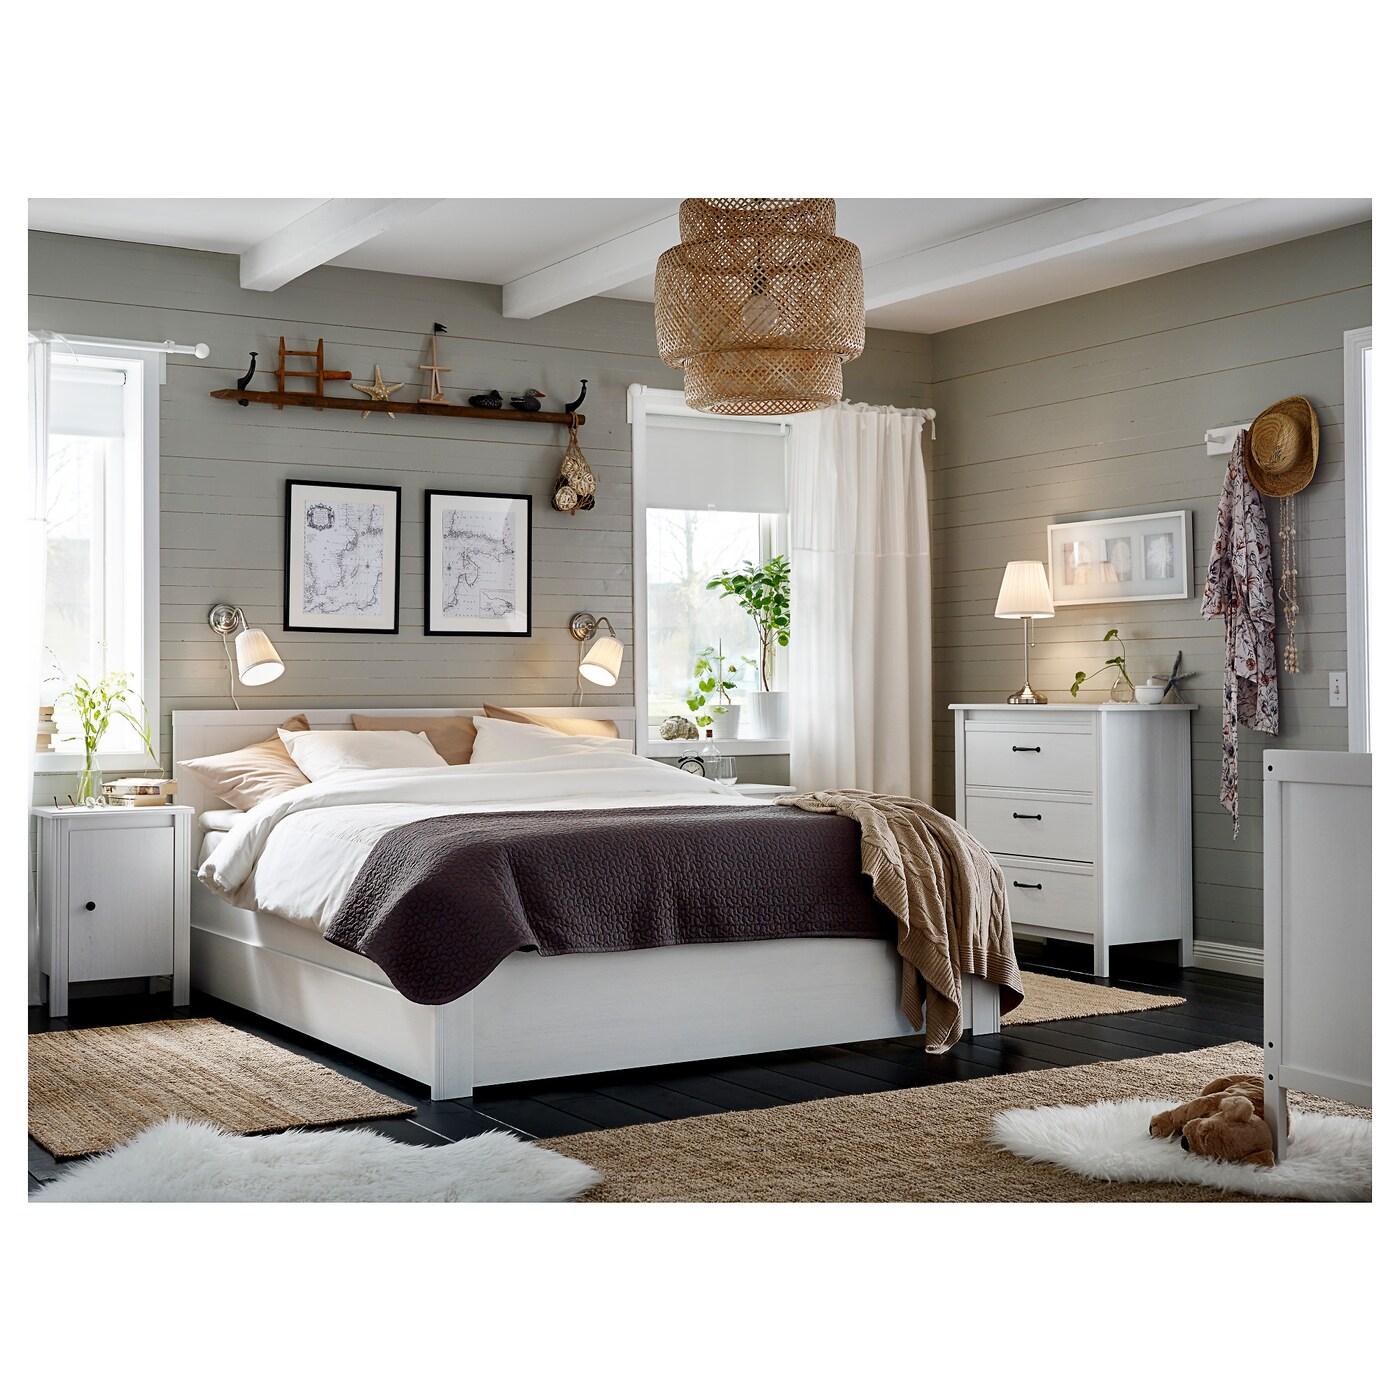 rstid applique nickel blanc ikea. Black Bedroom Furniture Sets. Home Design Ideas